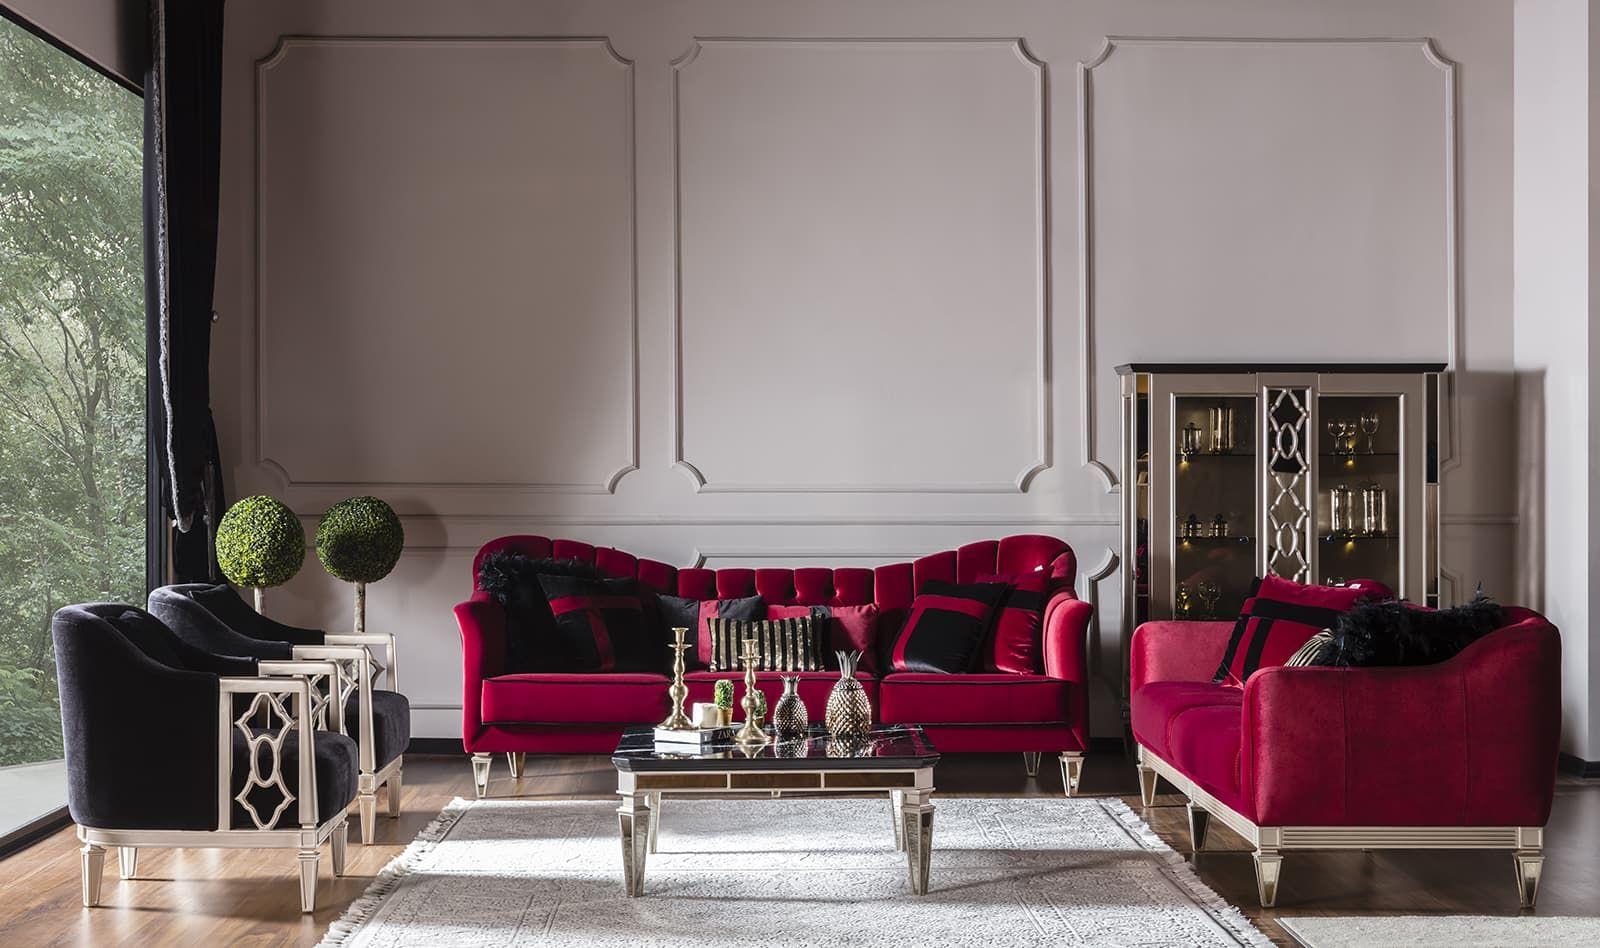 Class Red Koltuk Takimi Mobilya Fikirleri Art Deco Koltuklar